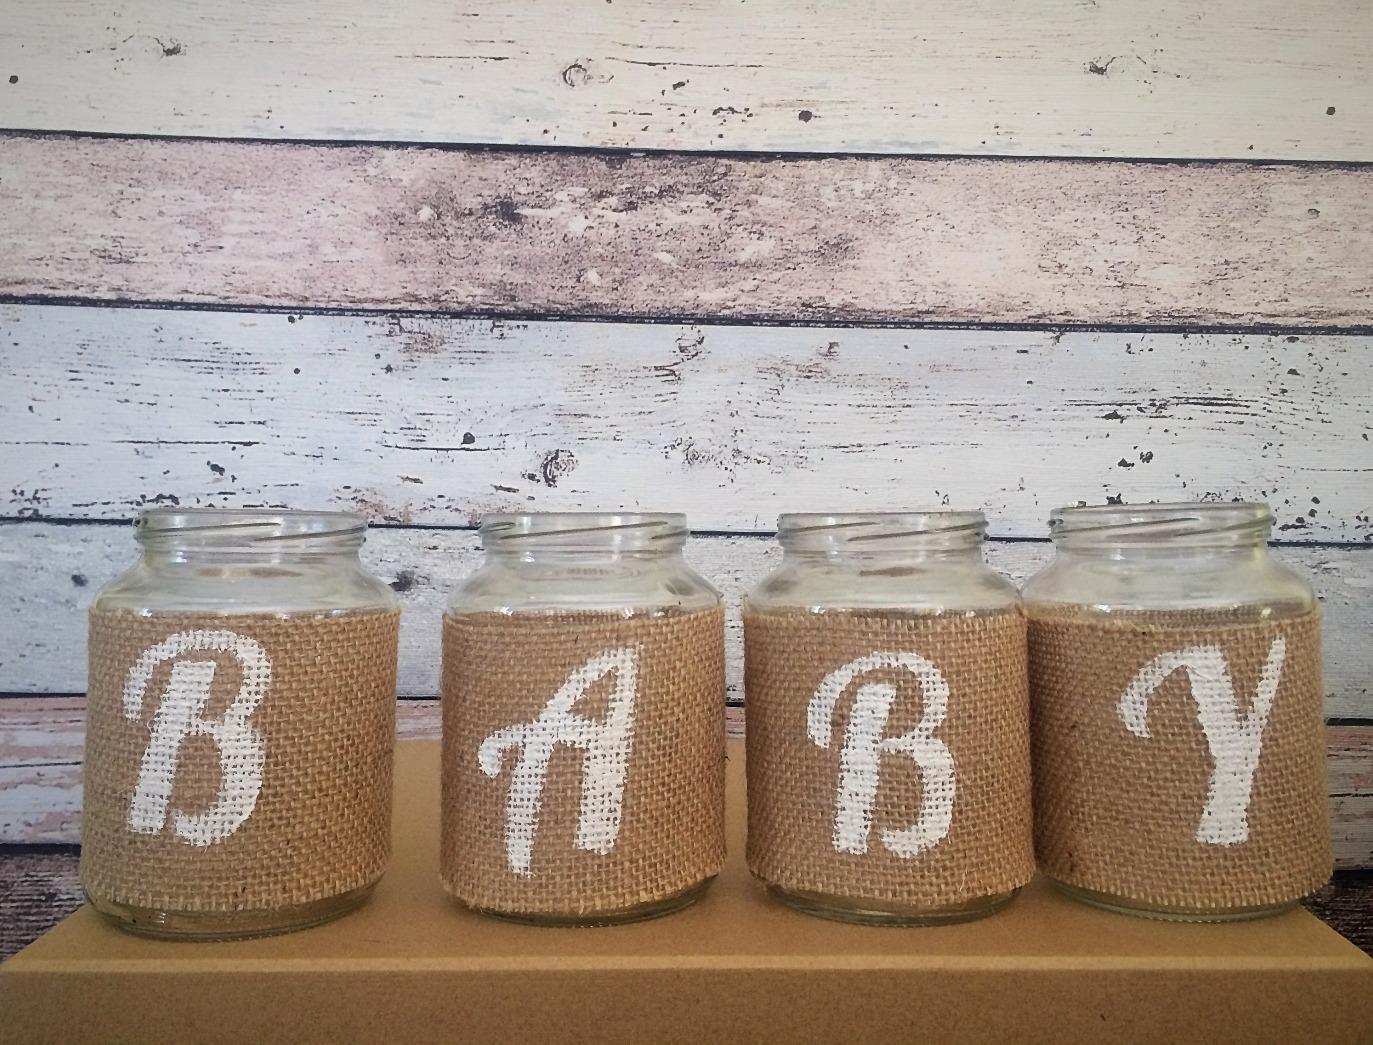 BABY JARS